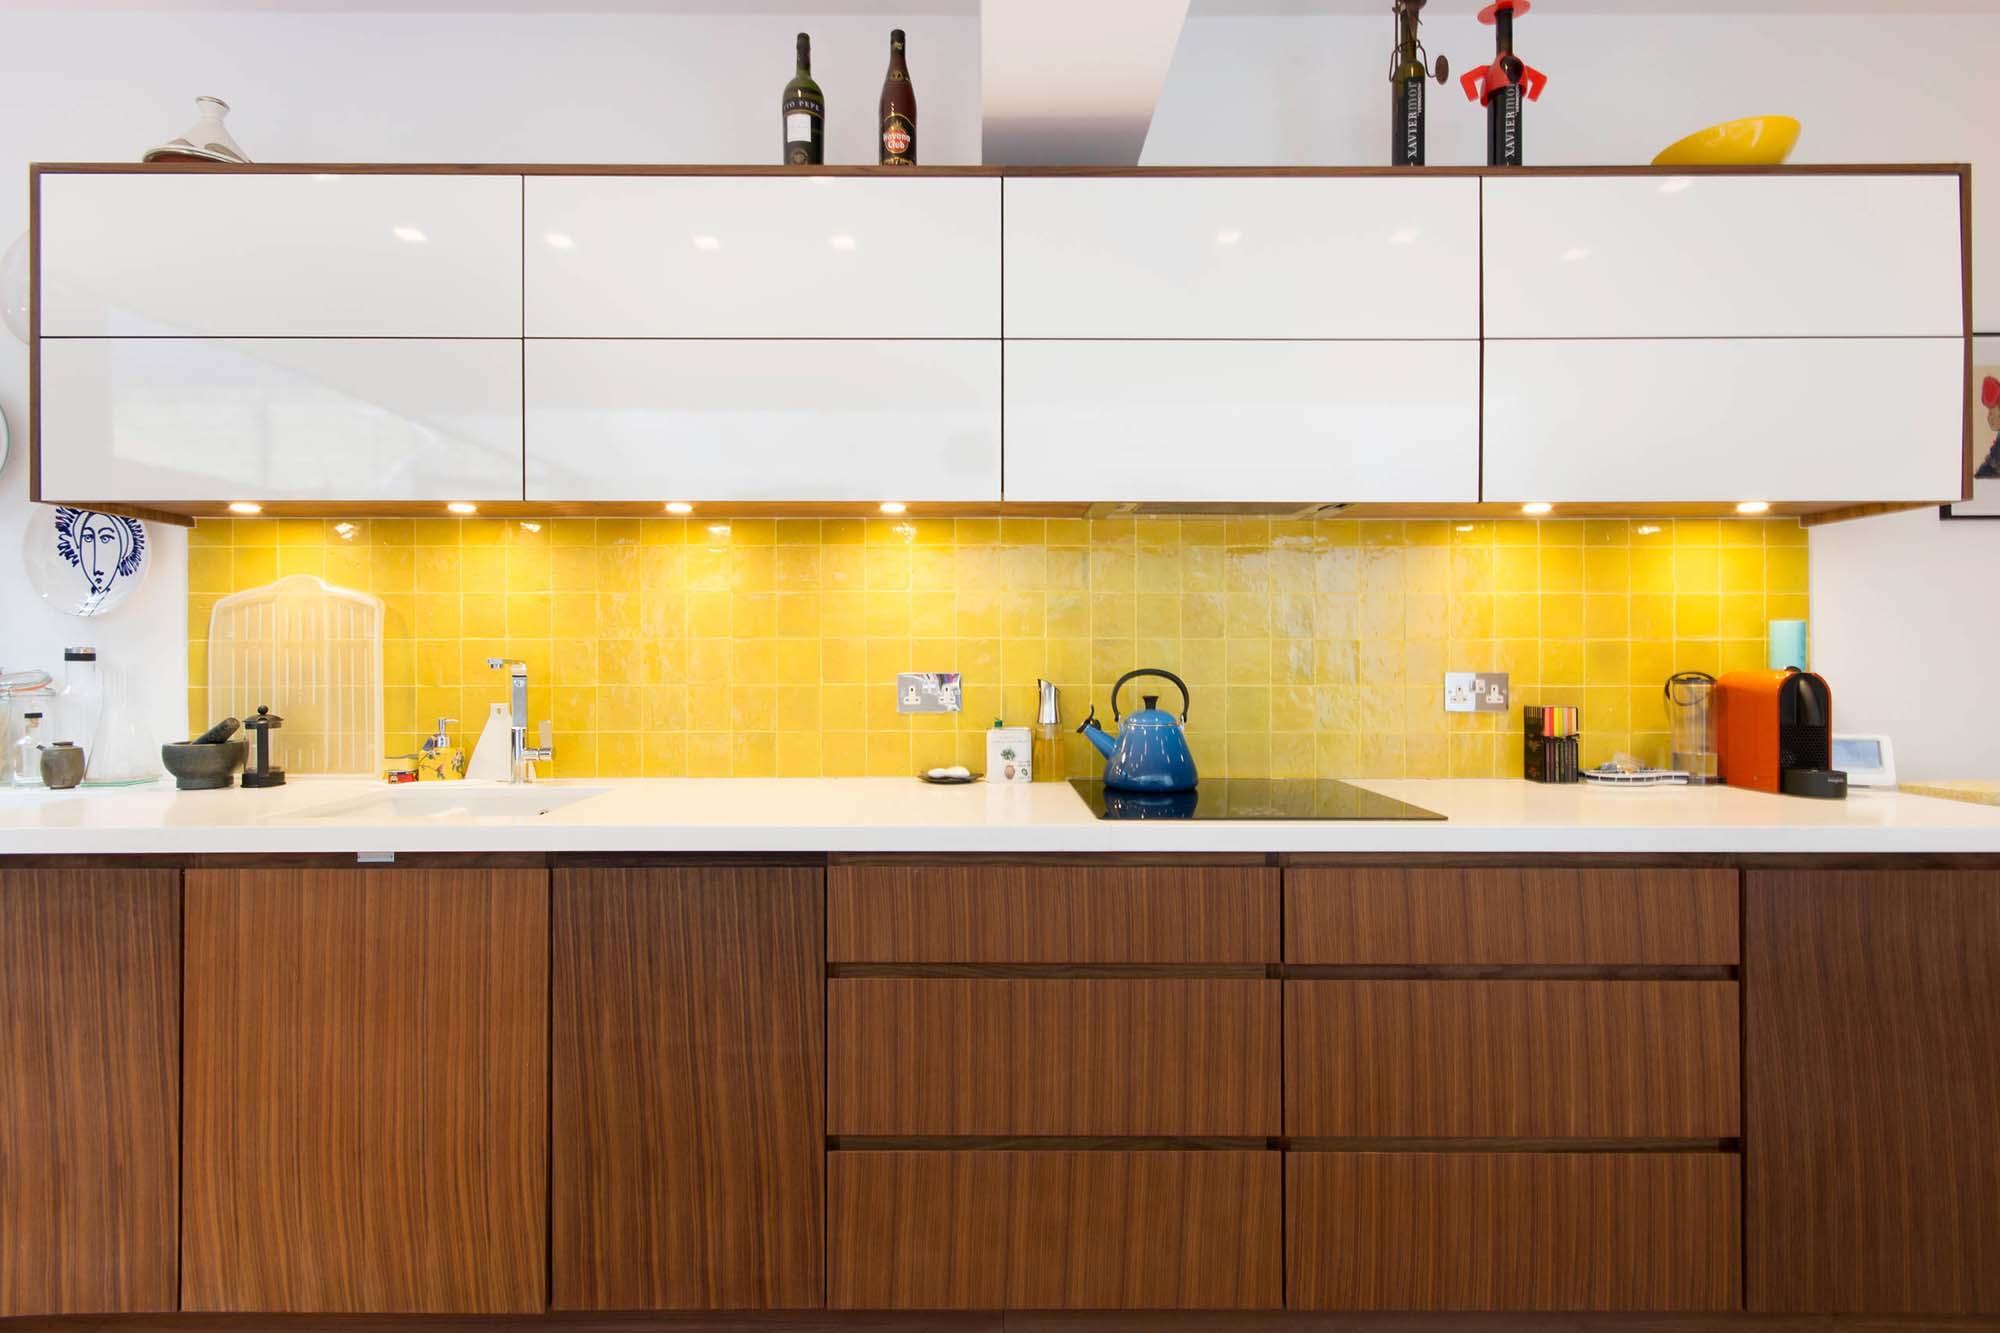 Коричнево-белый кухонный гарнитур с желтым фартуком